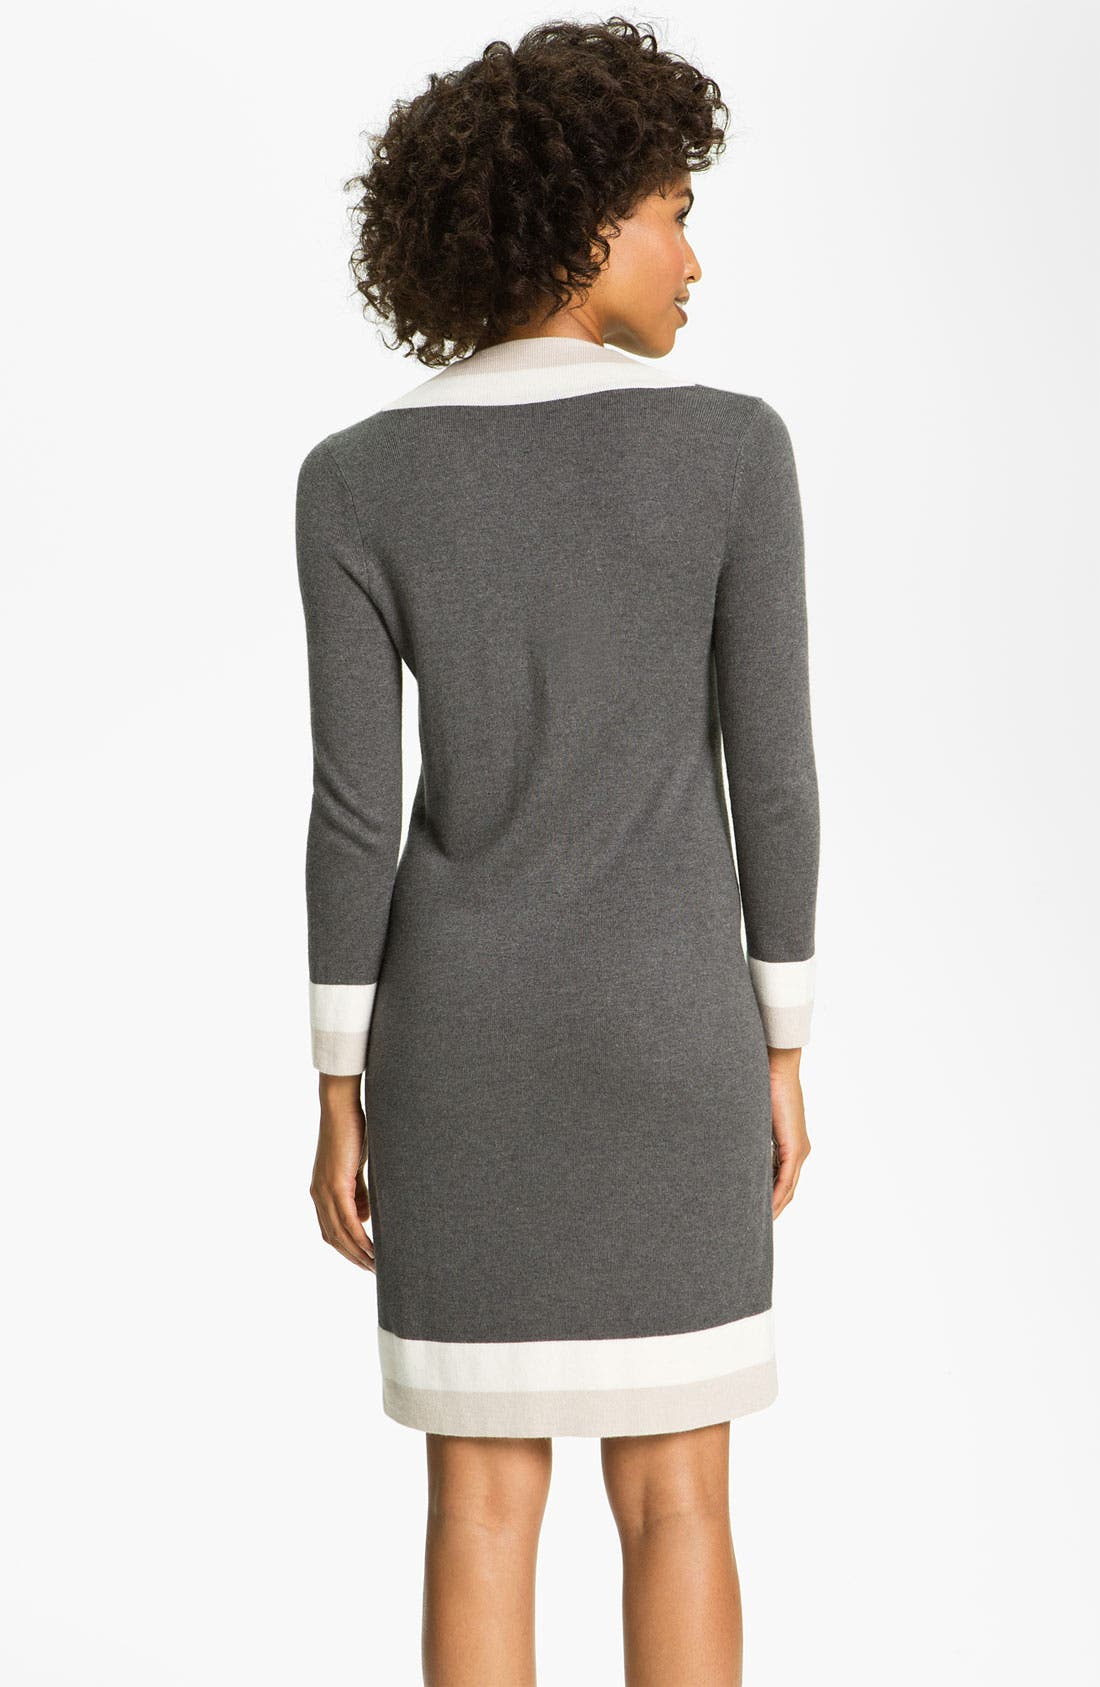 Alternate Image 2  - Felicity & Coco Colorblock V-Neck Sweater Dress (Regular & Petite) (Nordstrom Exclusive)